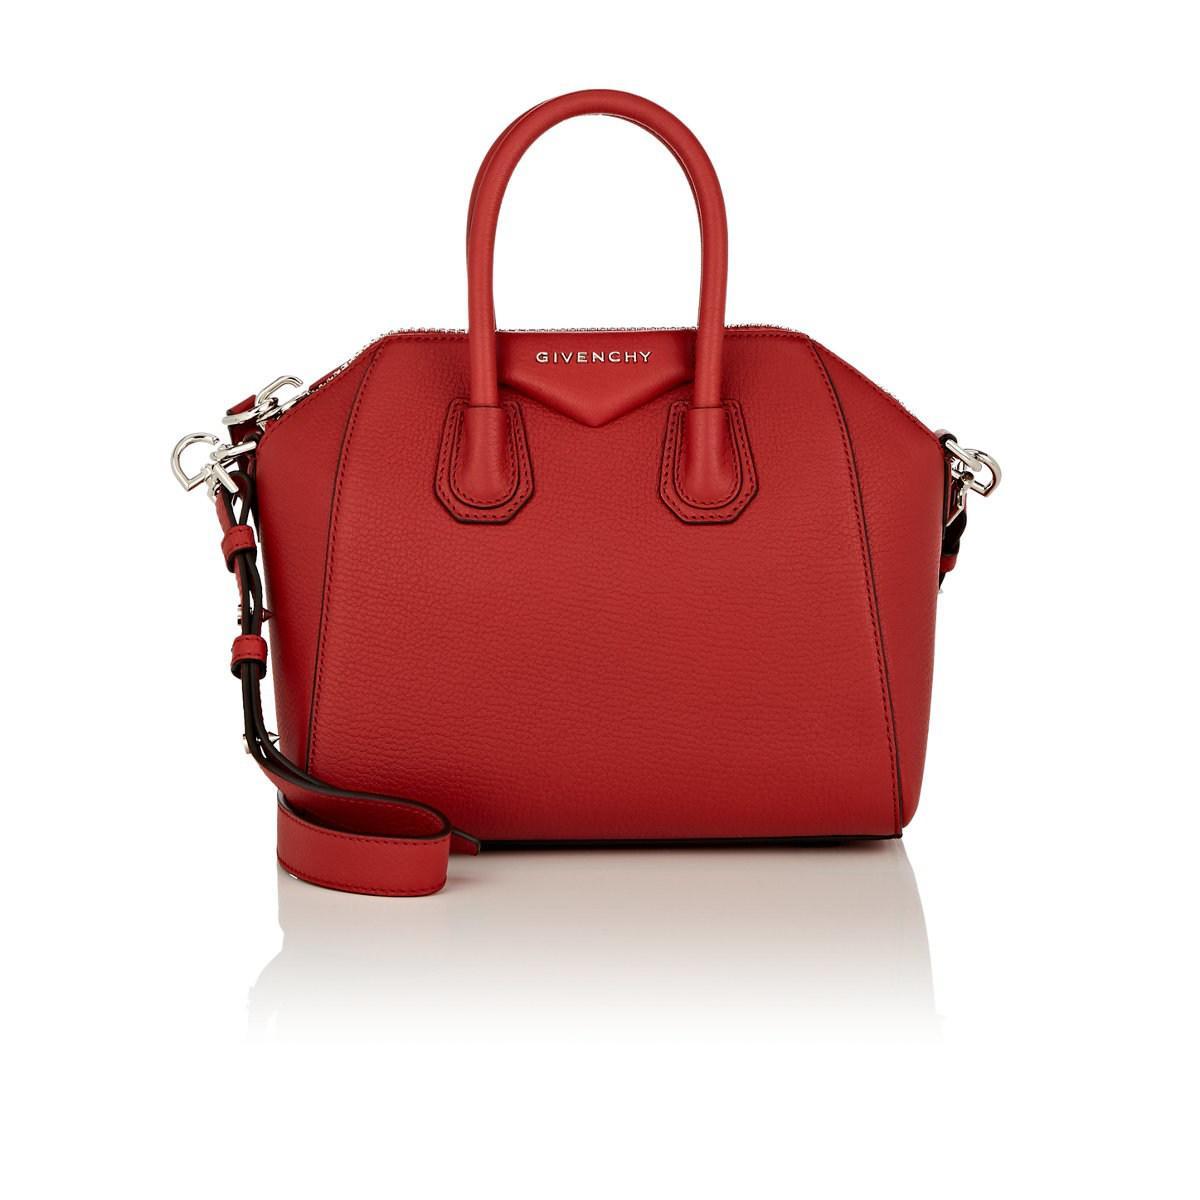 Givenchy - Antigona Mini Textured-leather Tote Red One Size - Lyst. View  fullscreen 3531388731112